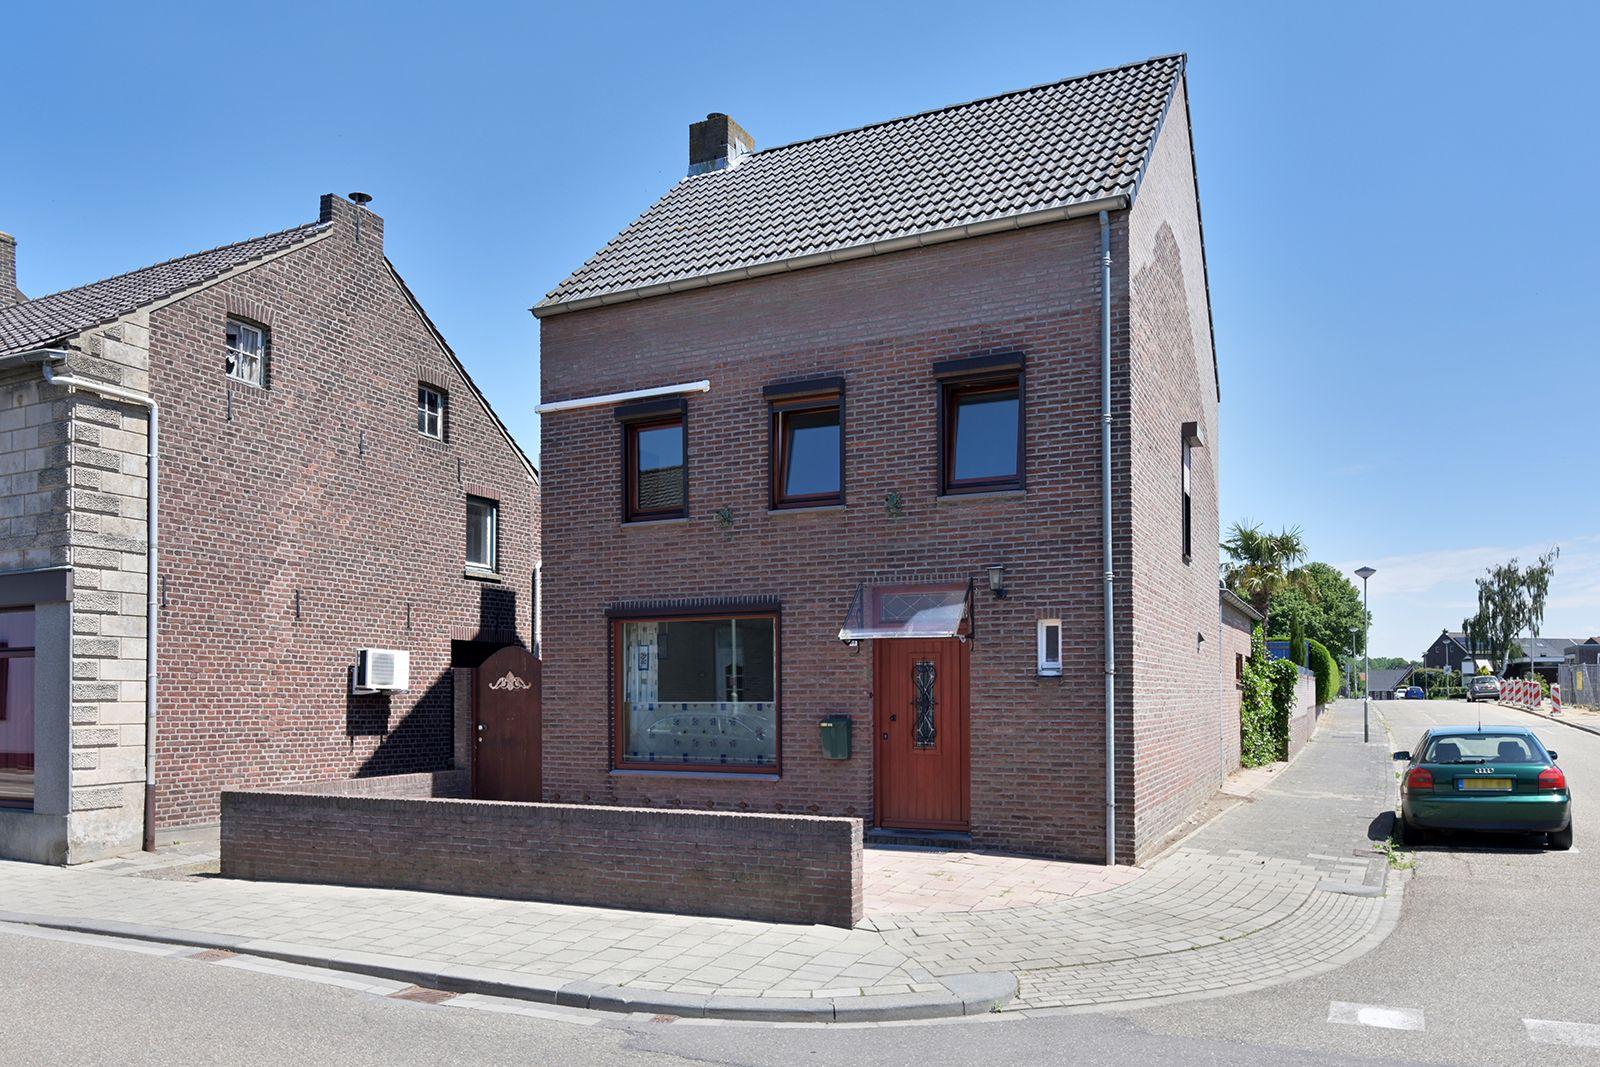 Kruisstraat 98, Stein